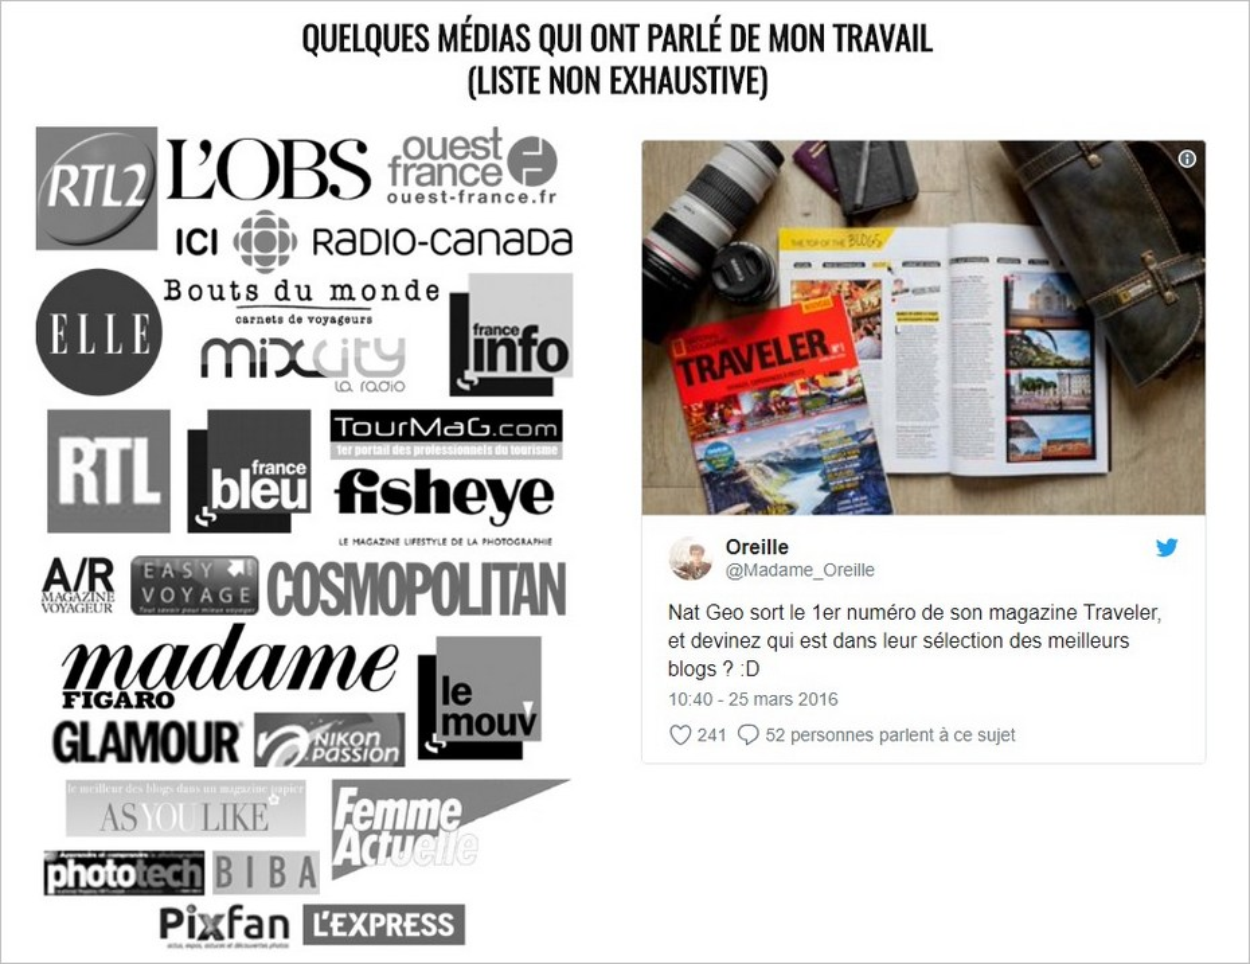 Madame Oreille - Page A propos